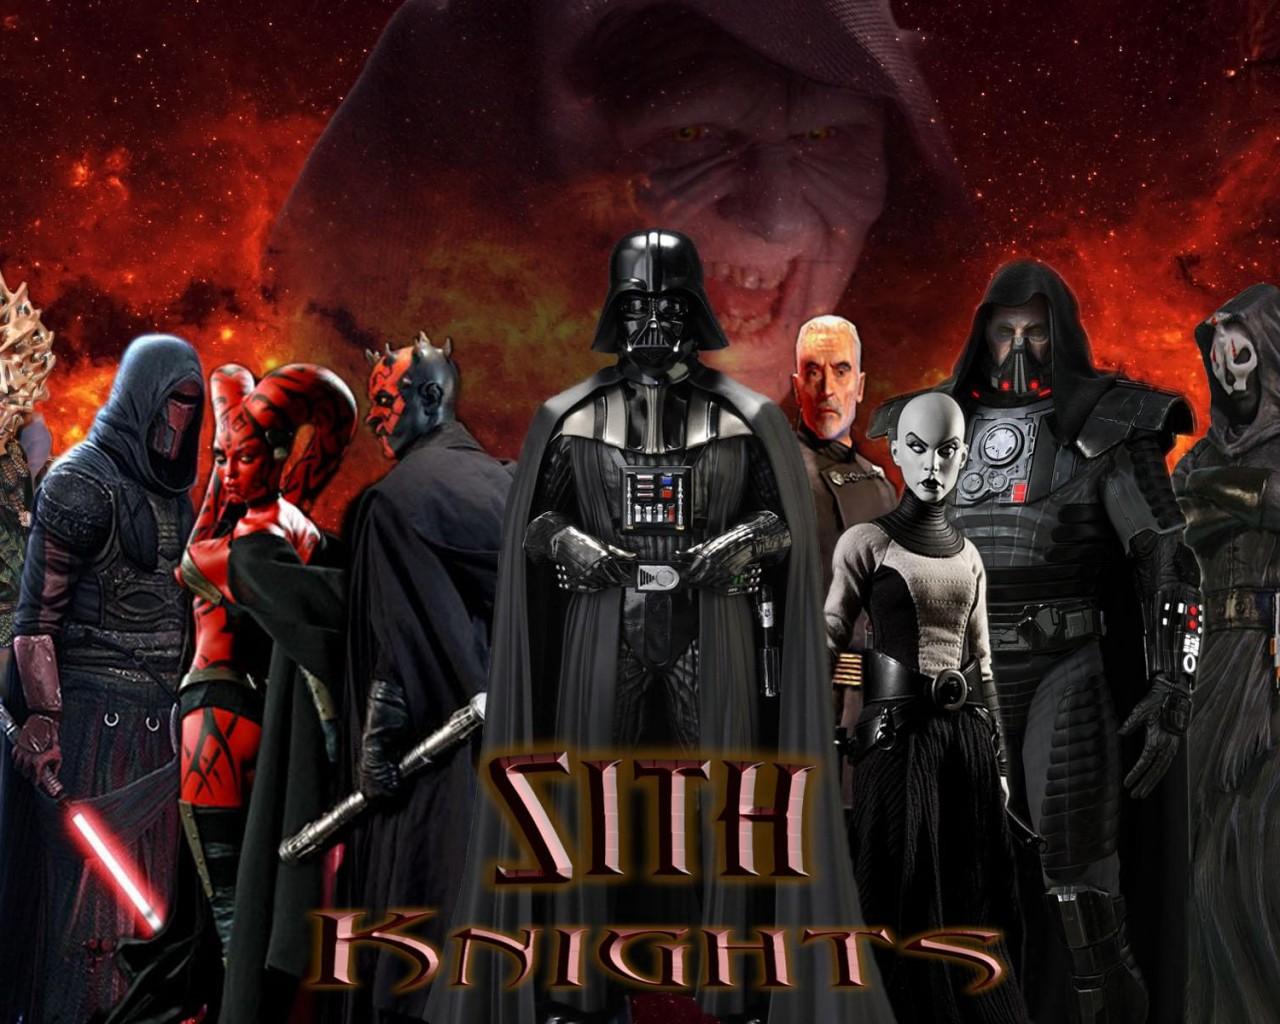 Star Wars Wallpaper Star Wars Sith Wallpaper Hd , HD Wallpaper & Backgrounds